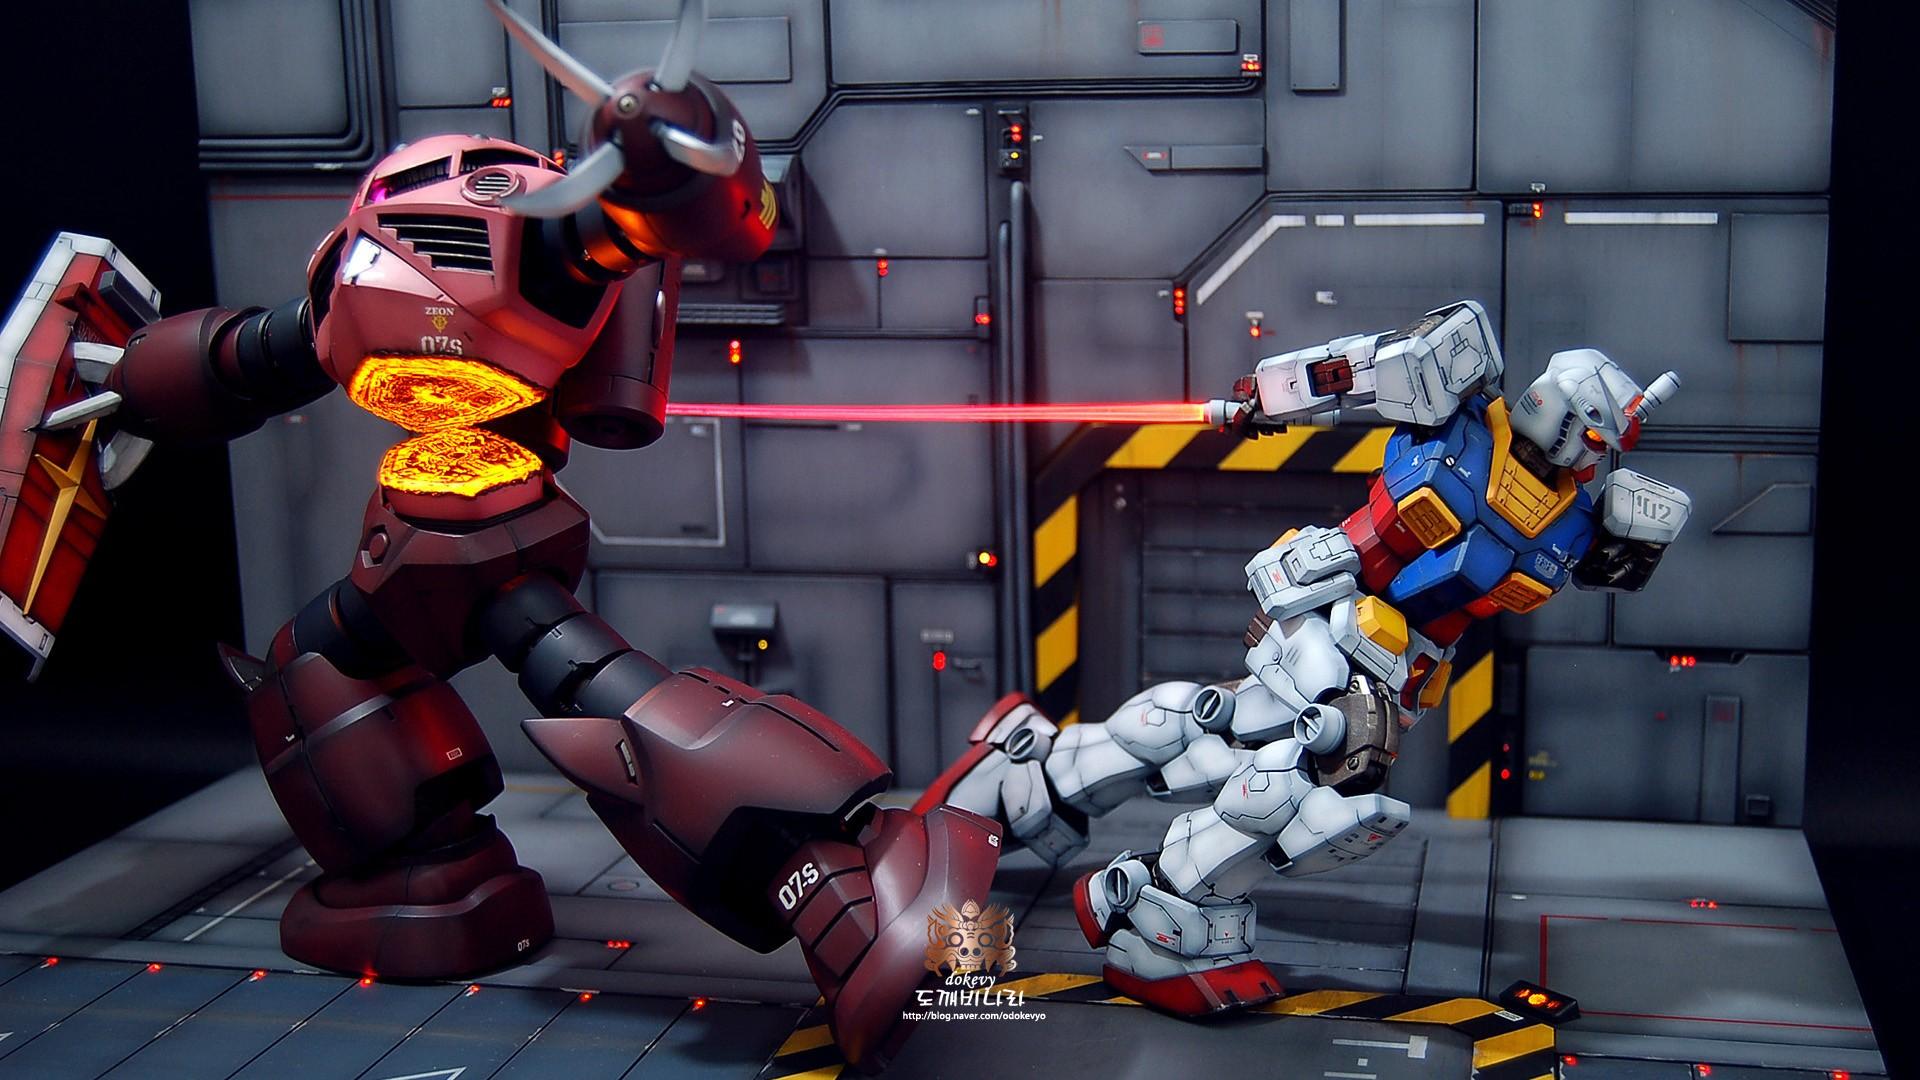 Download Gundam Wallpaper Wallpoper